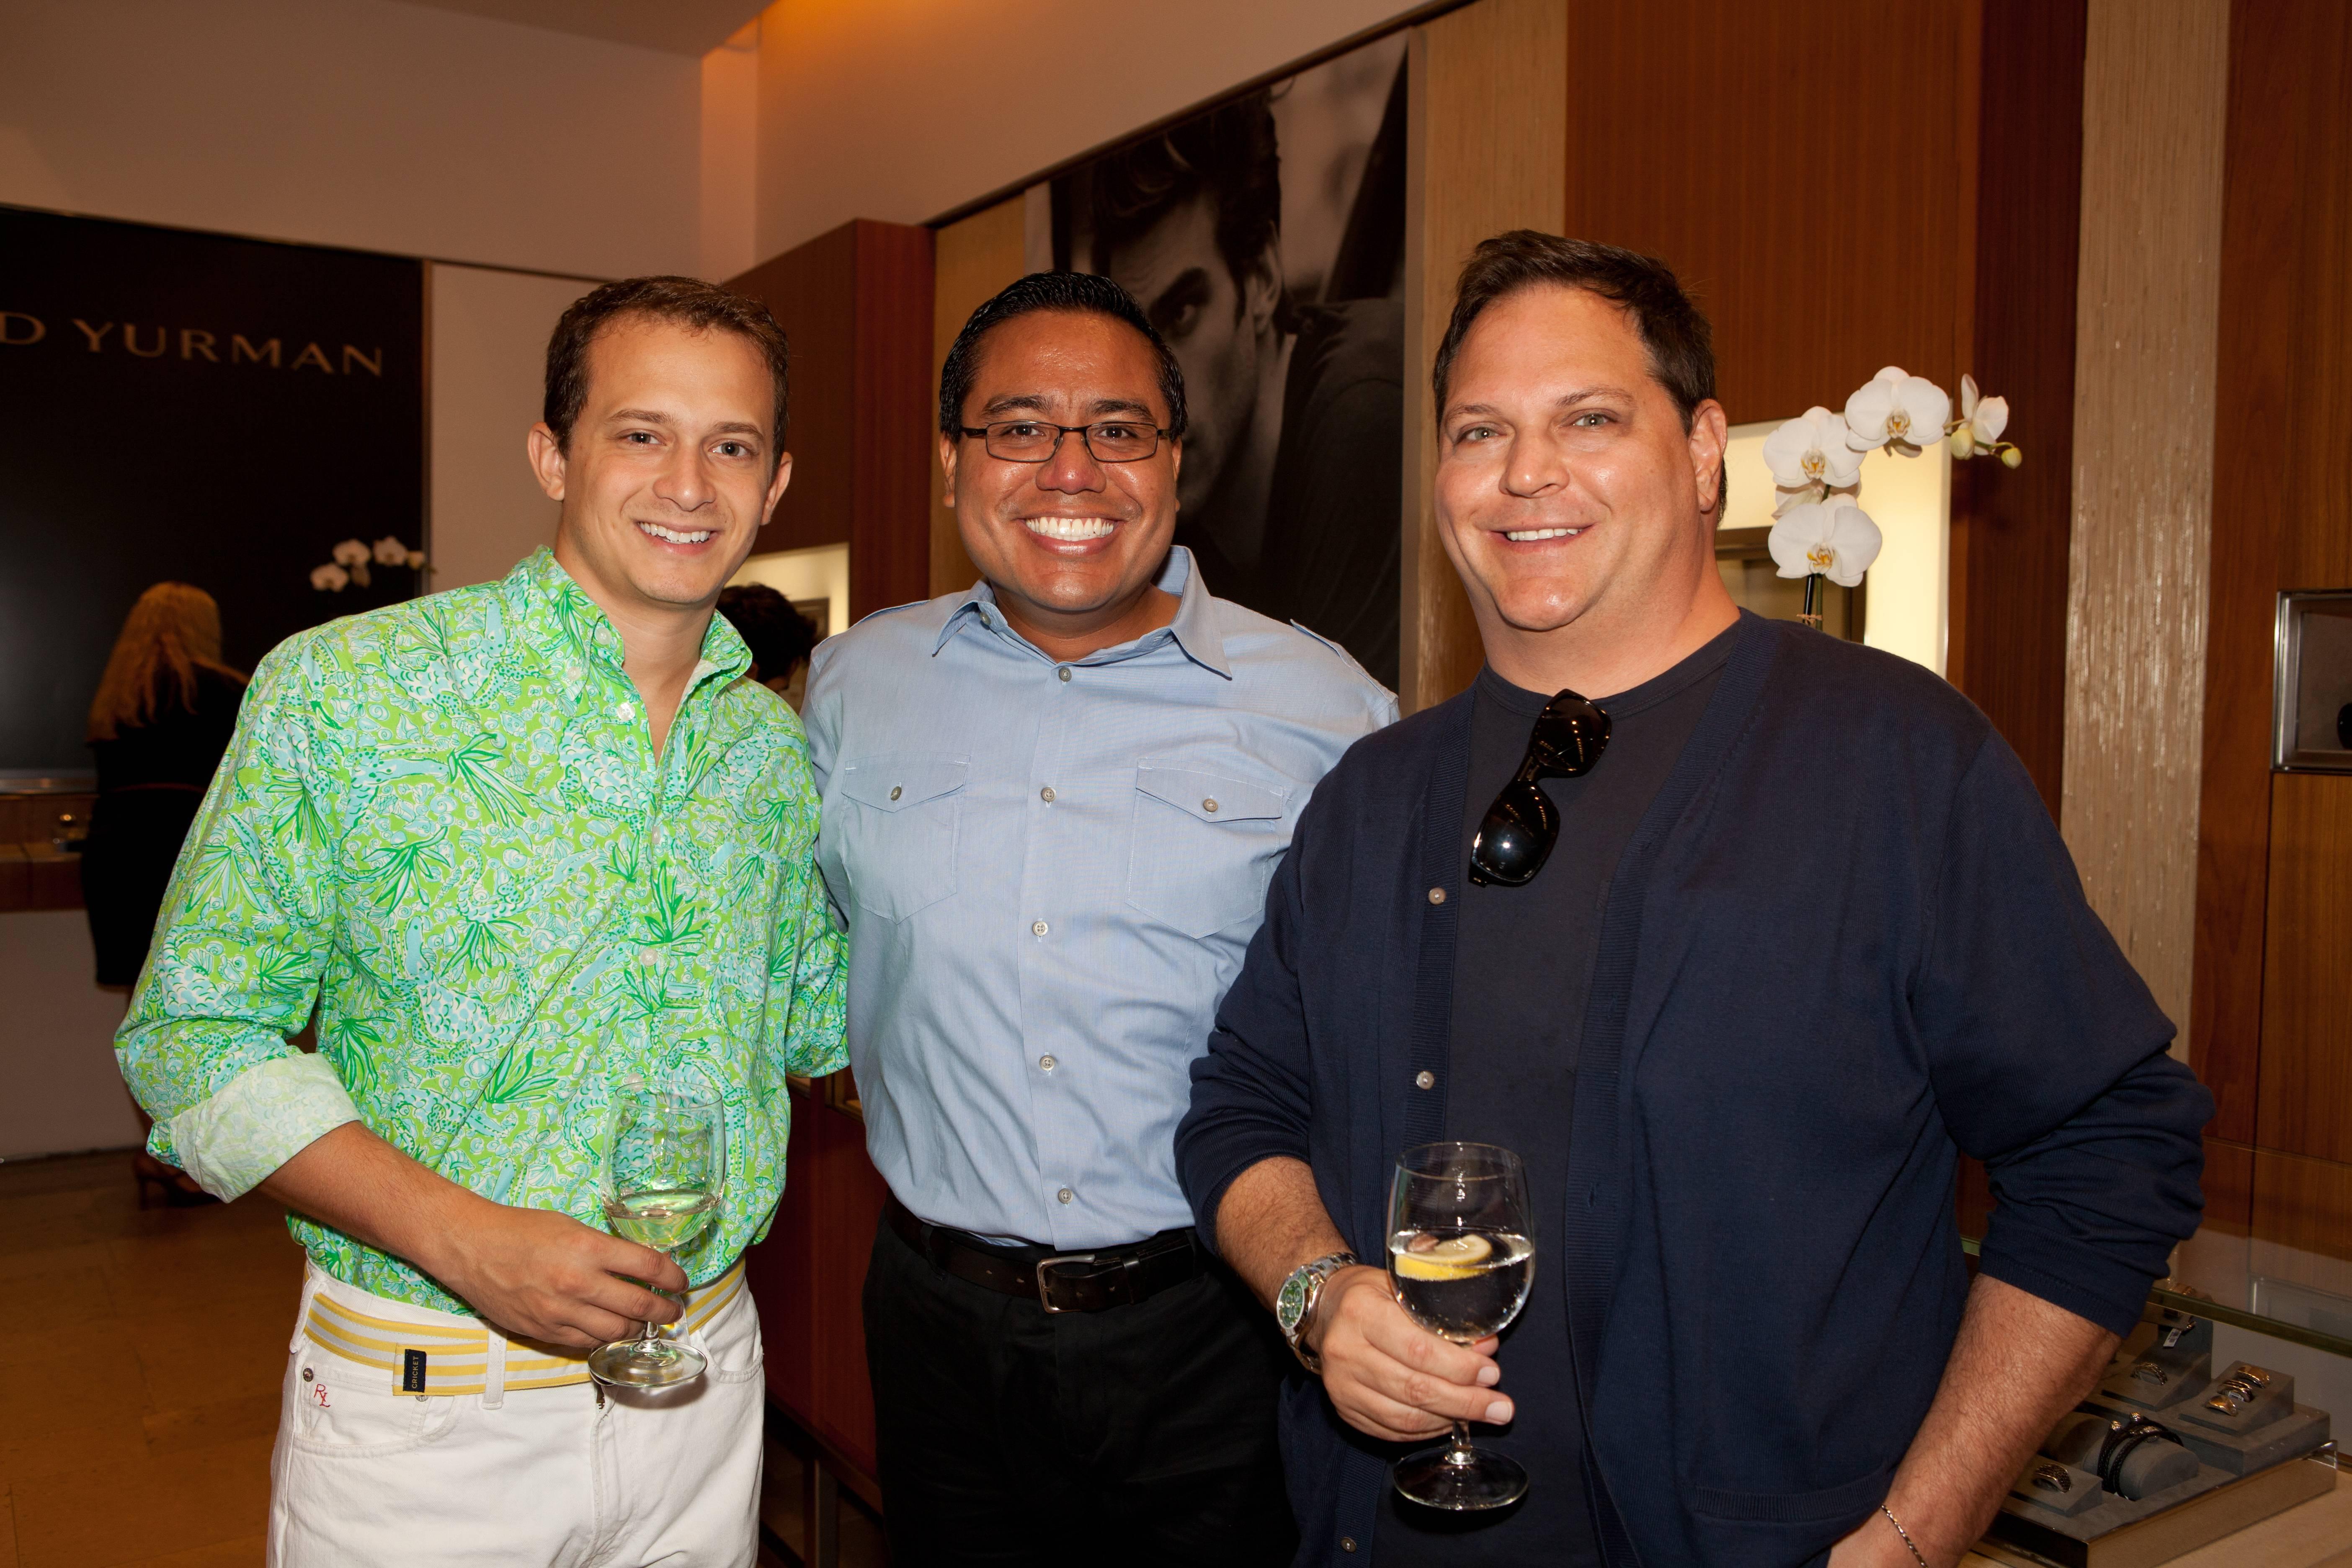 Edward Menhert, Blair Douglas-Russell,David Guzman